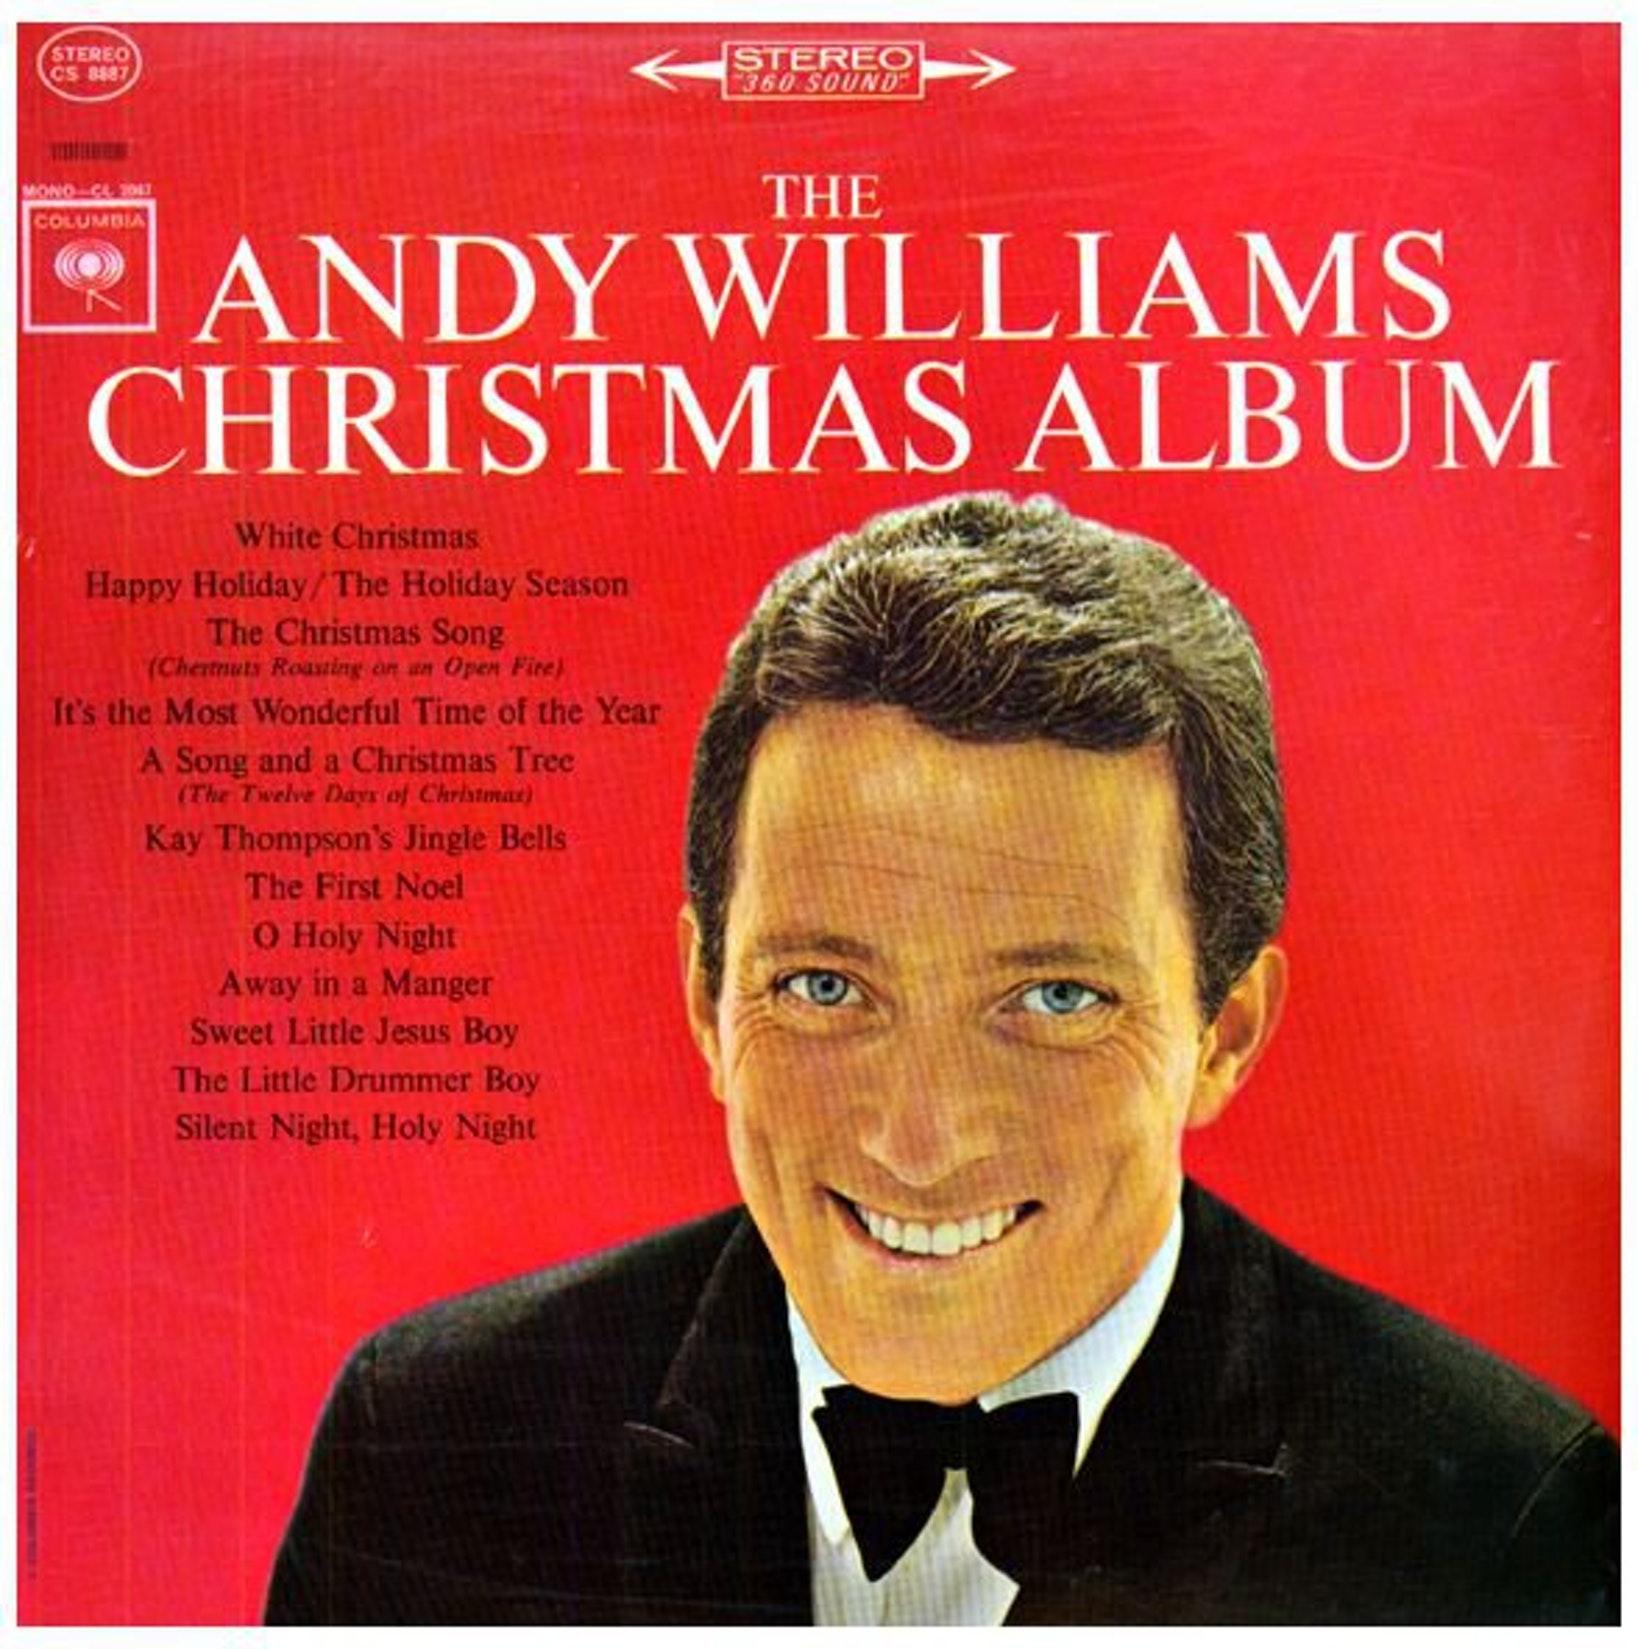 tinhte_christmas_giang_sinh_vinyl_album (2).jpg